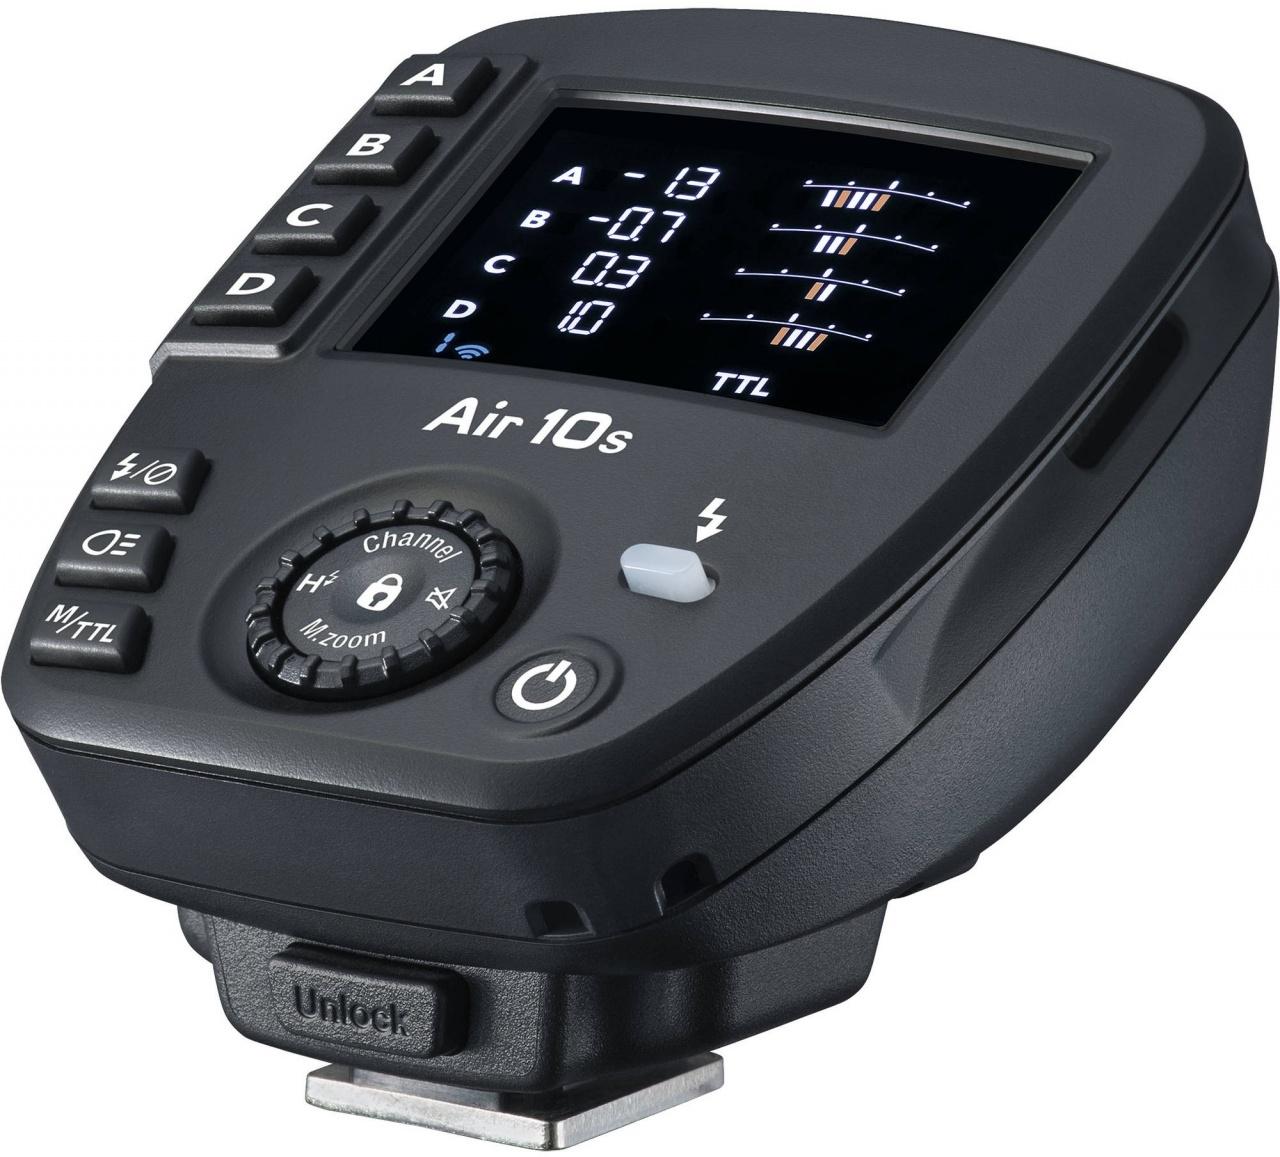 NISSIN Air 10s vysílač pro Canon